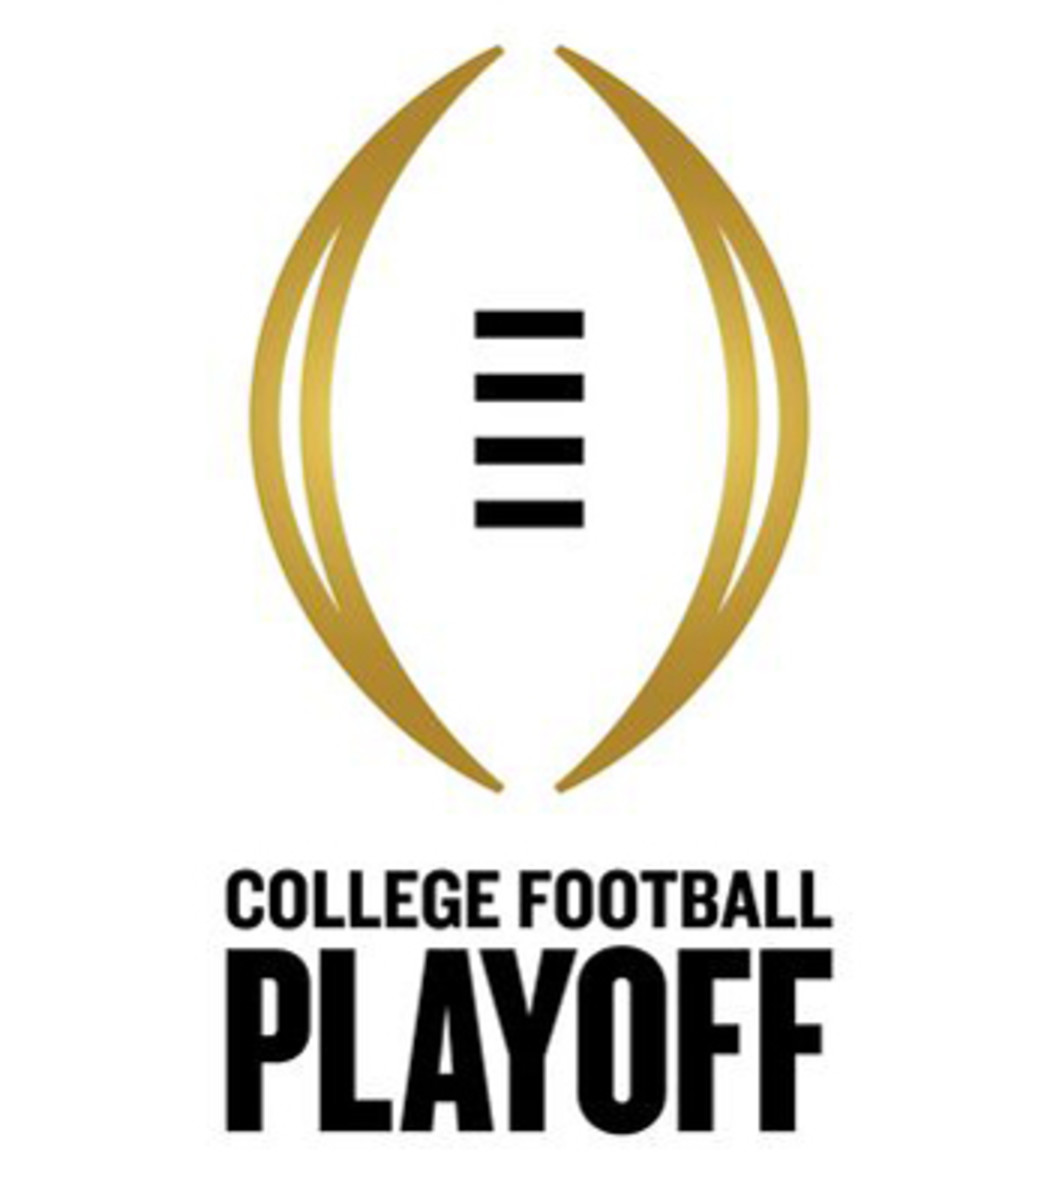 ncaa college football playoff